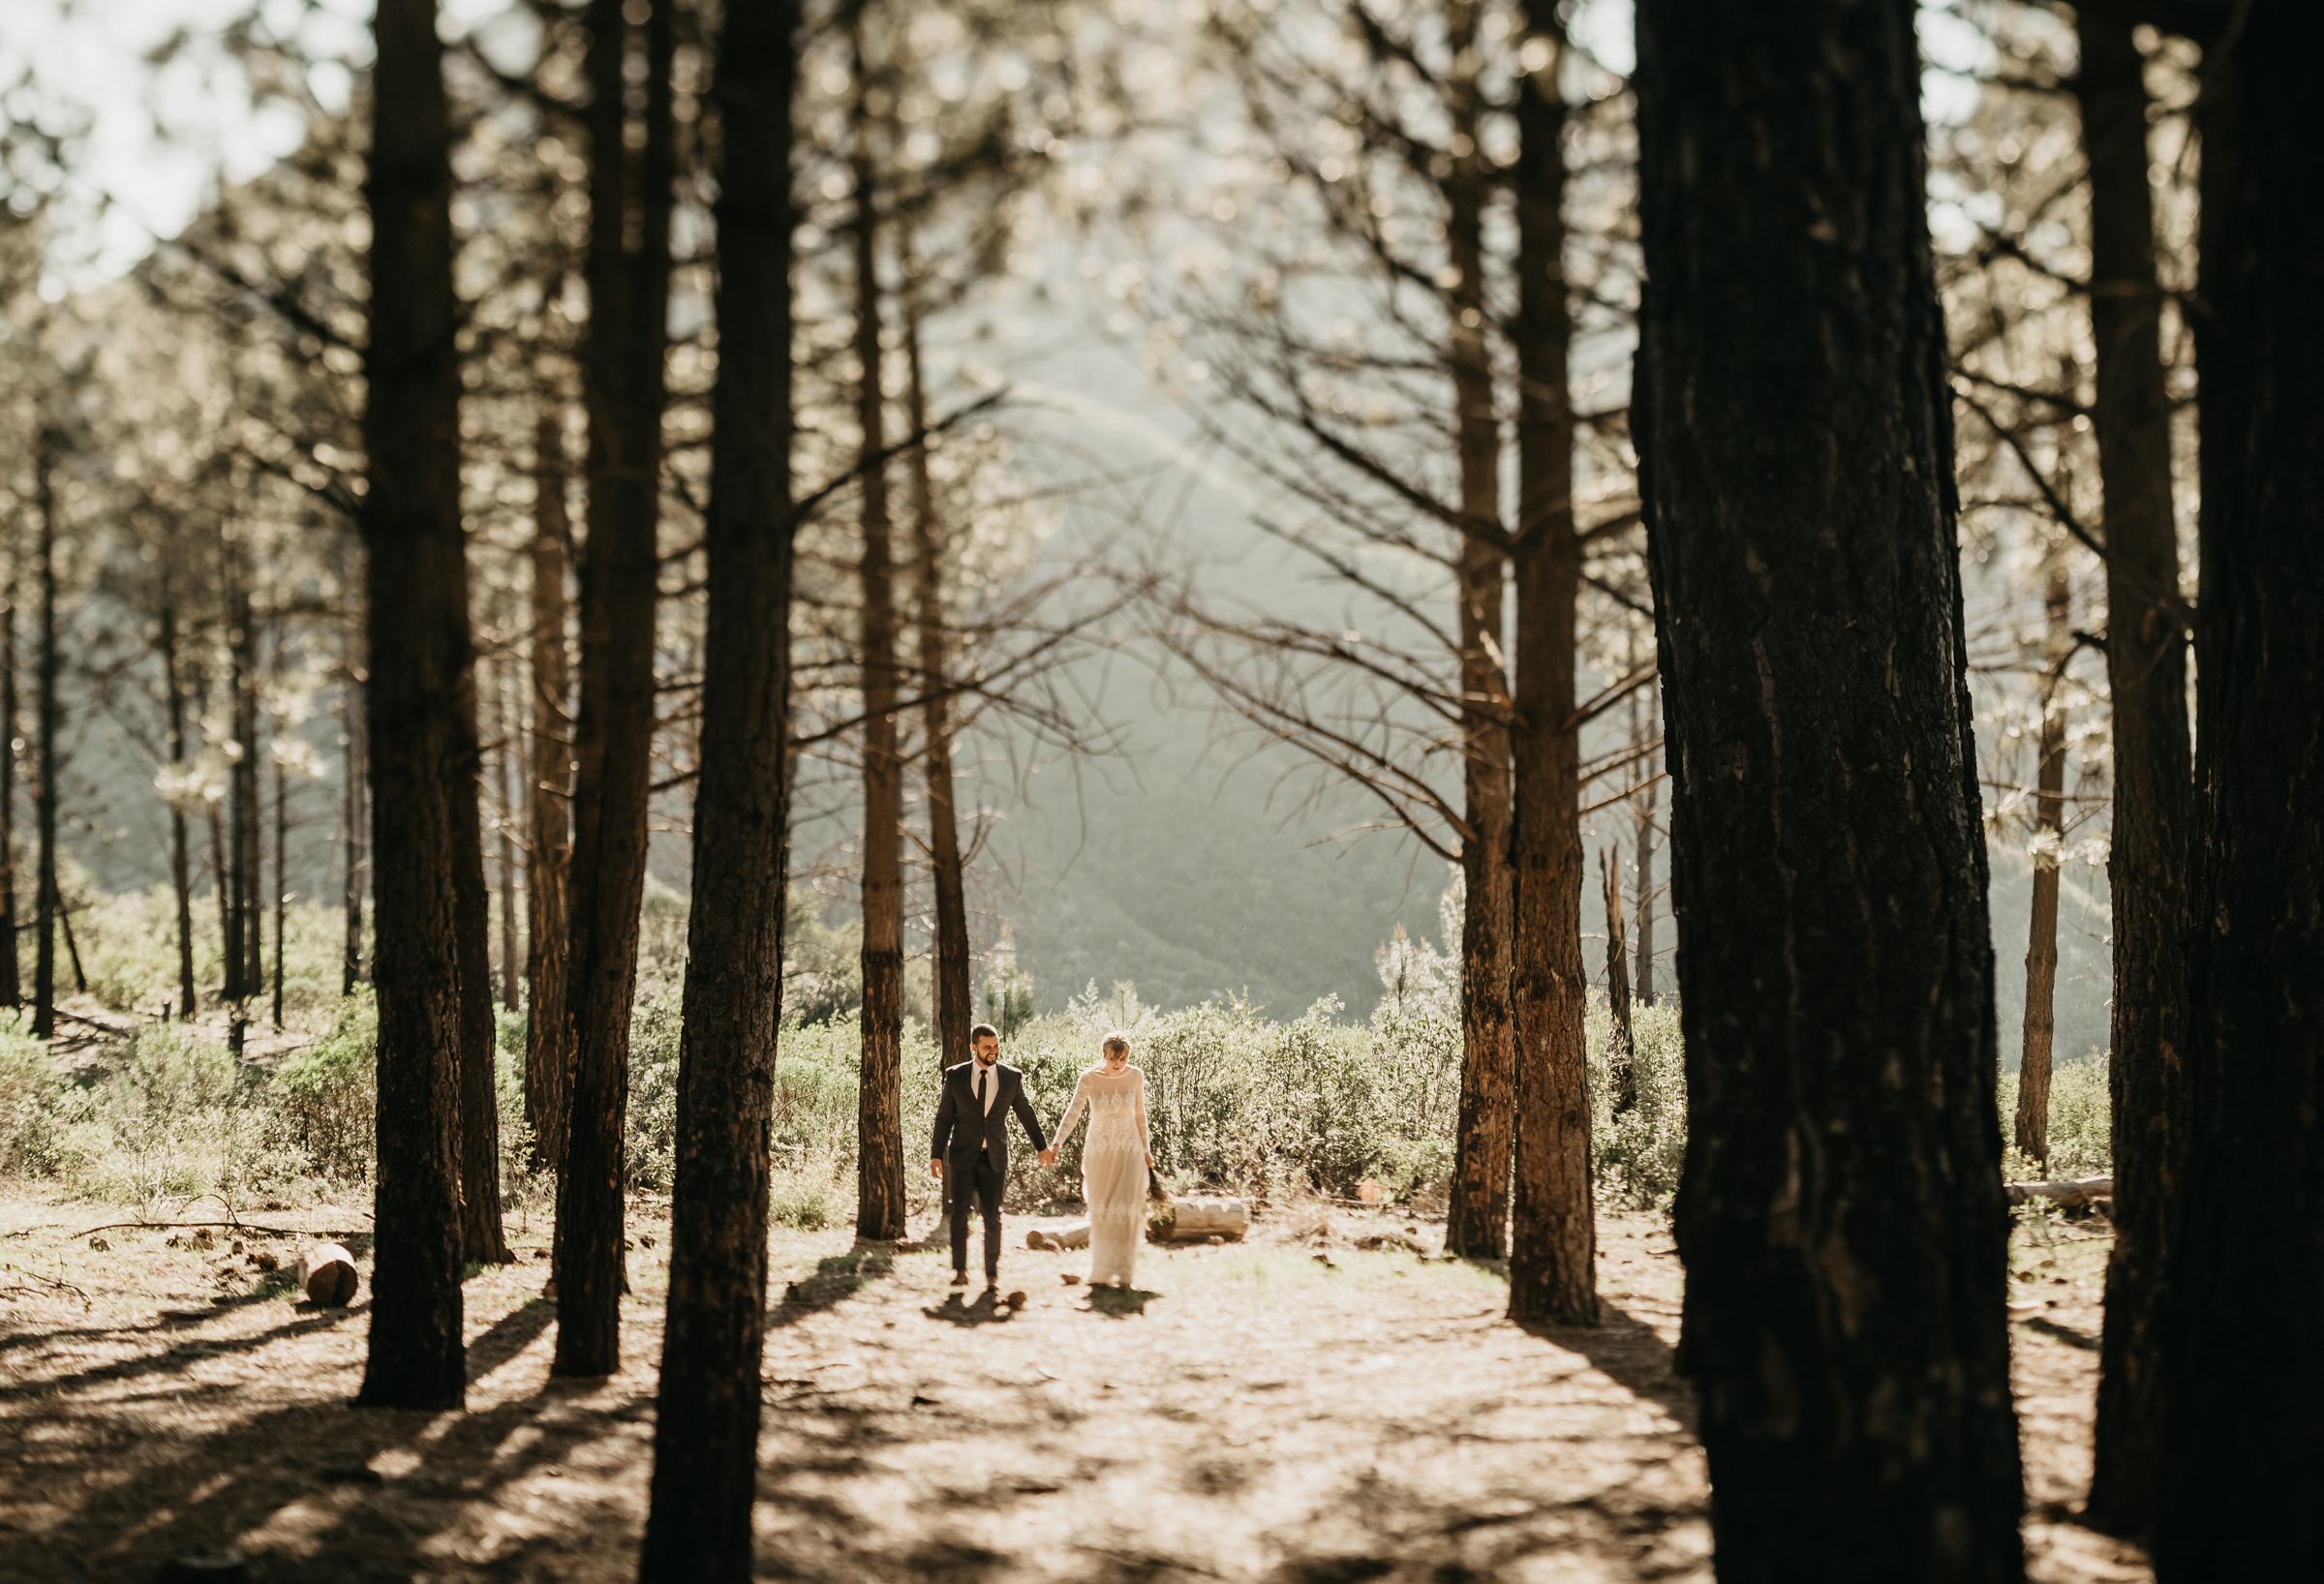 ©Isaiah + Taylor Photography - Los Angeles Wedding Photographers - Los Angeles Forest Wedding -33.jpg